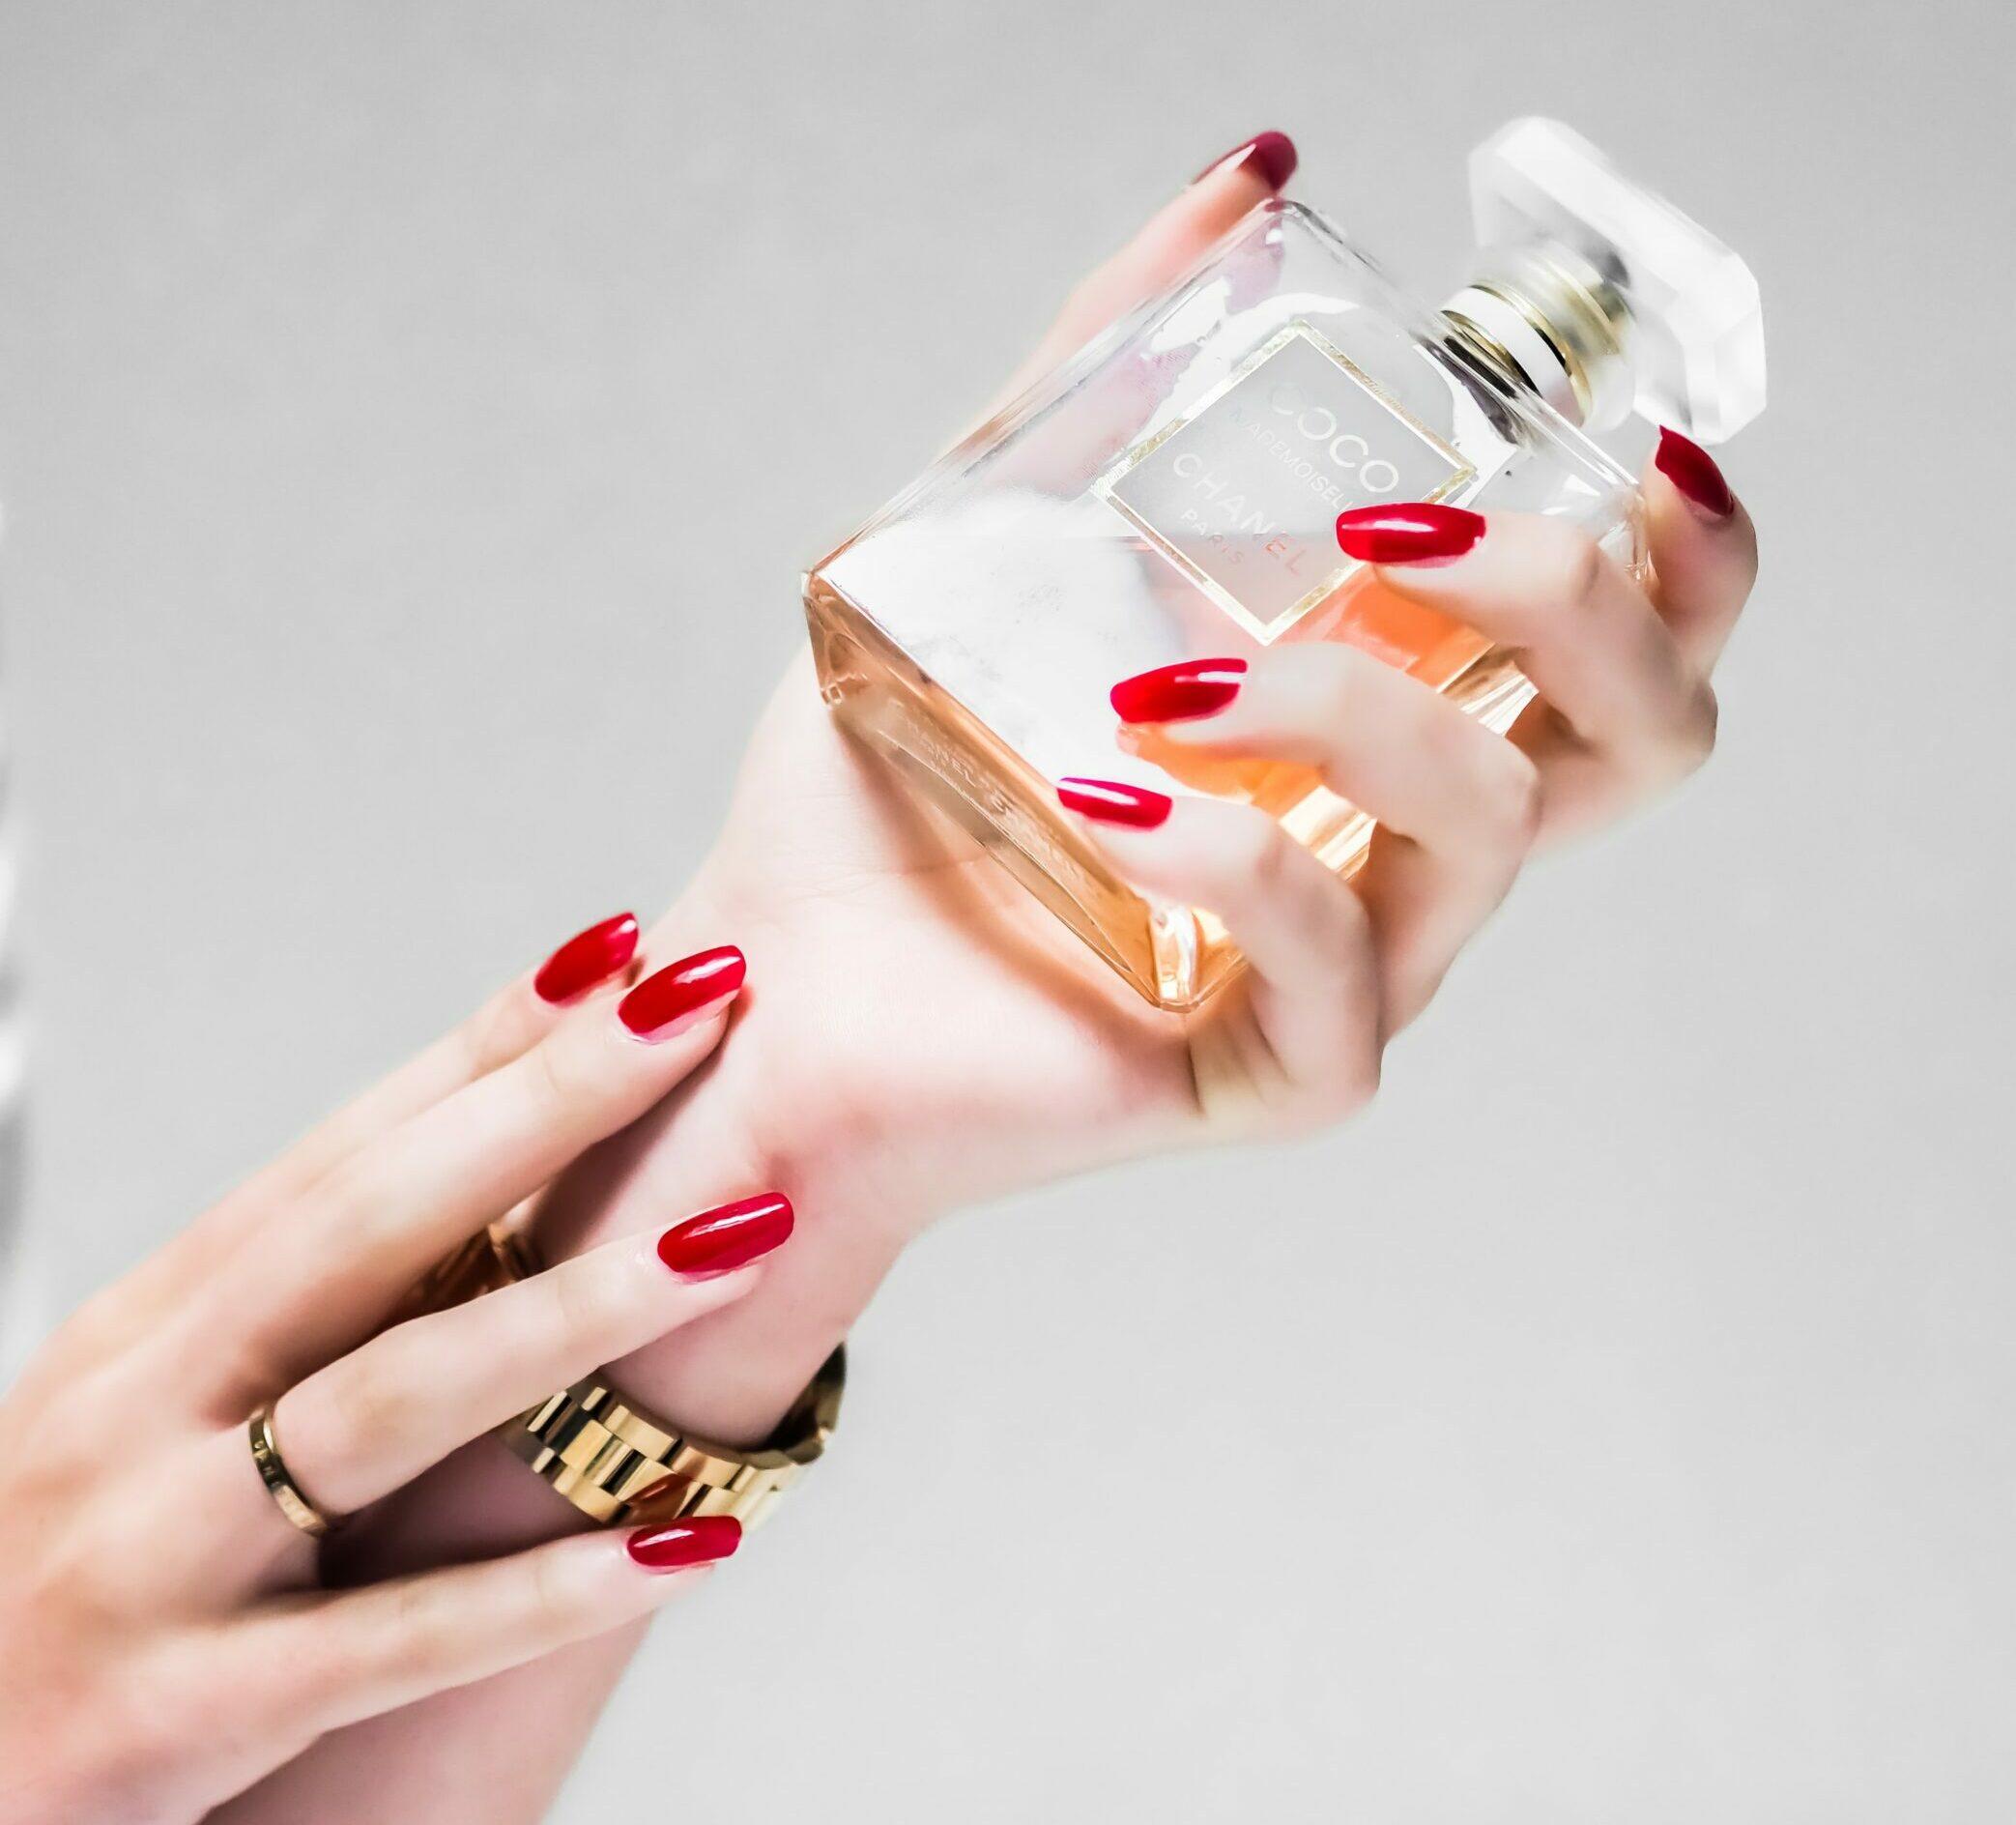 perfume - Last-Minute Christmas gift ideas for women